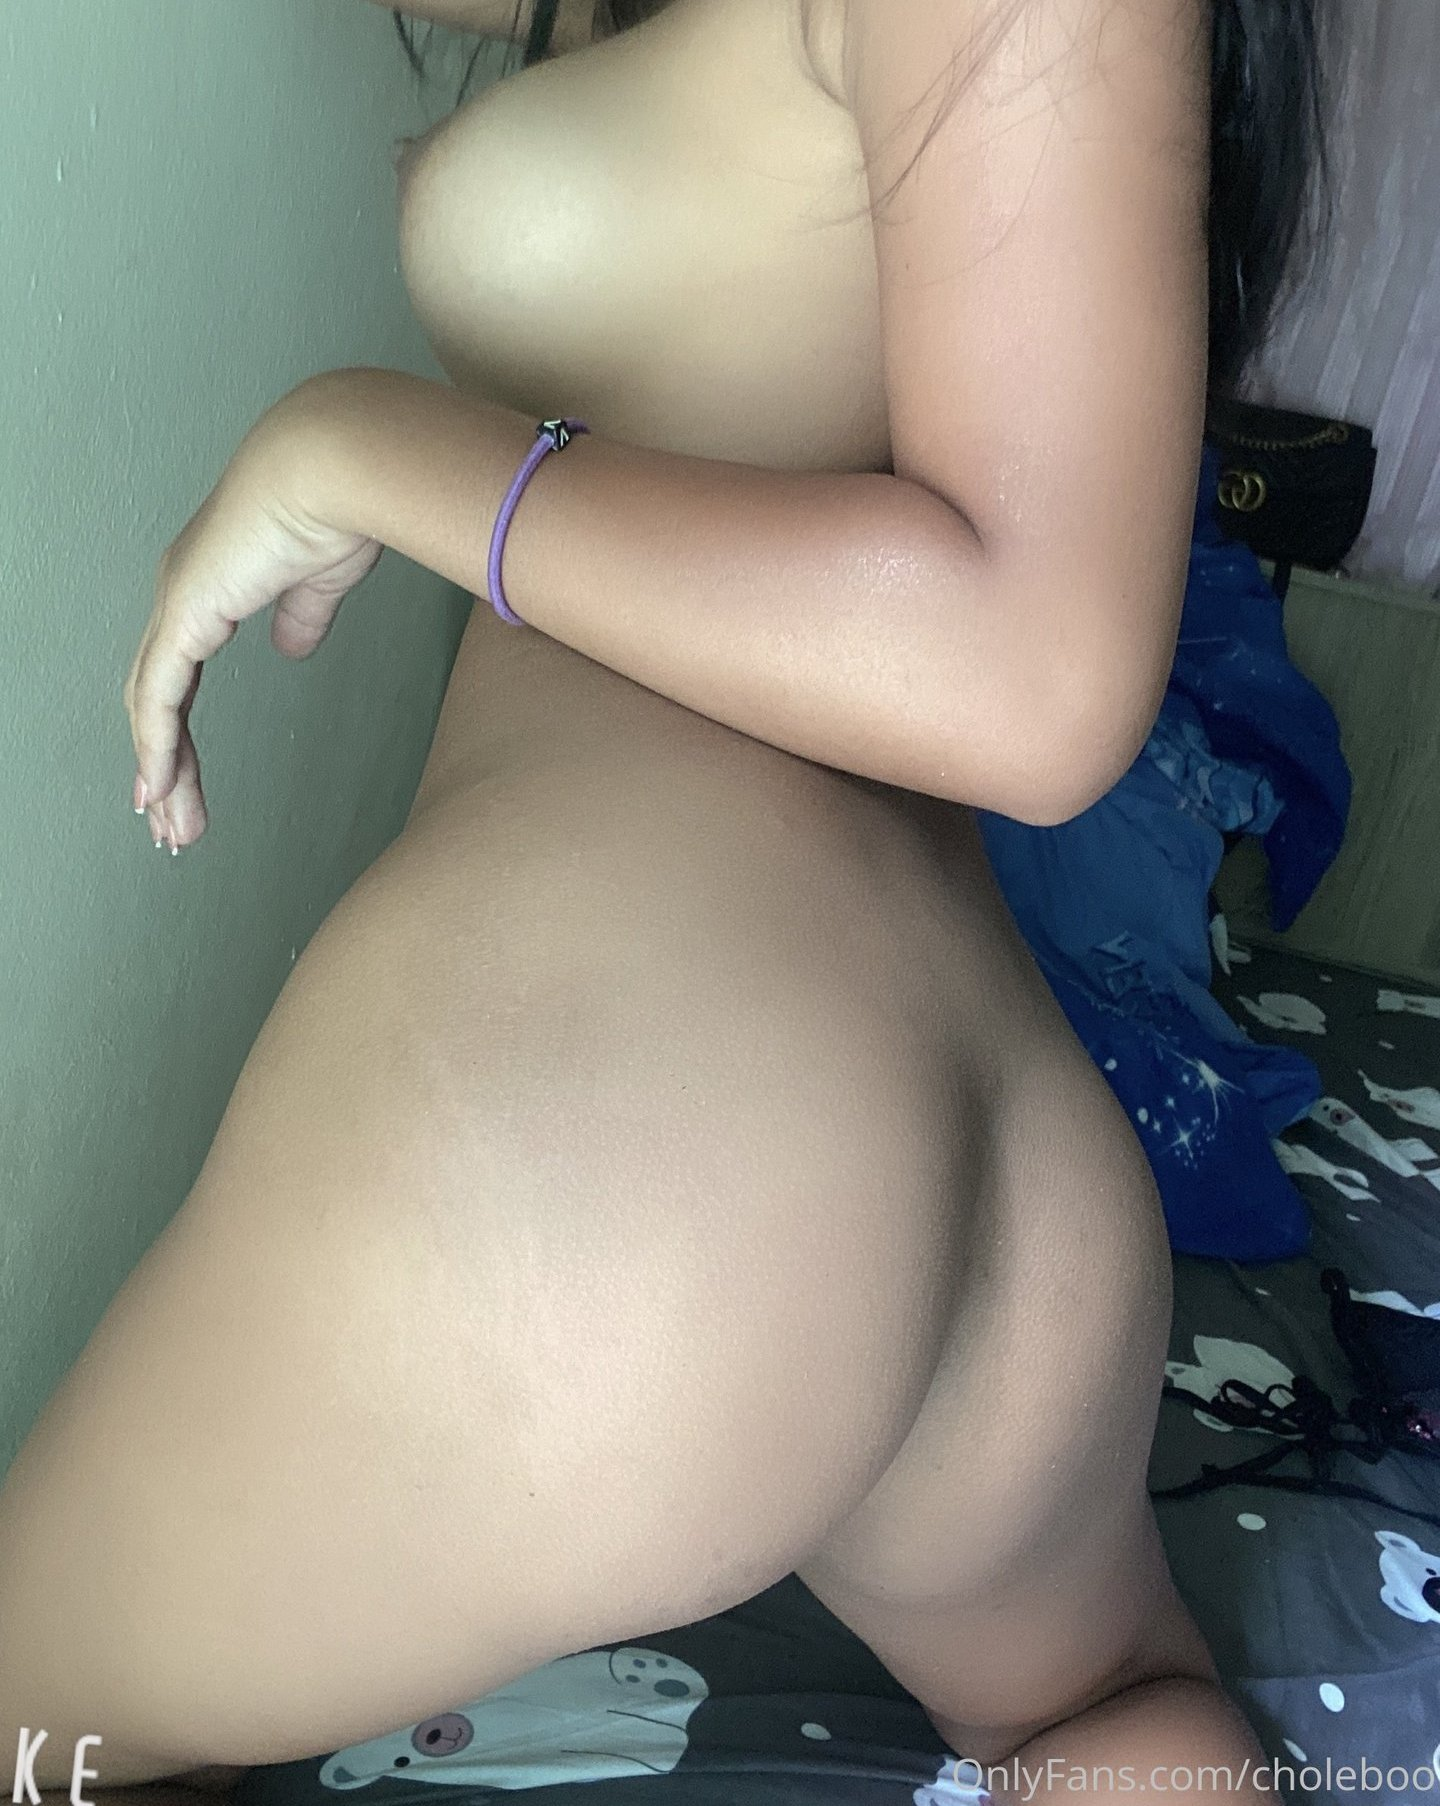 Chloe Choleboo Onlyfans Nude Leaks 0023